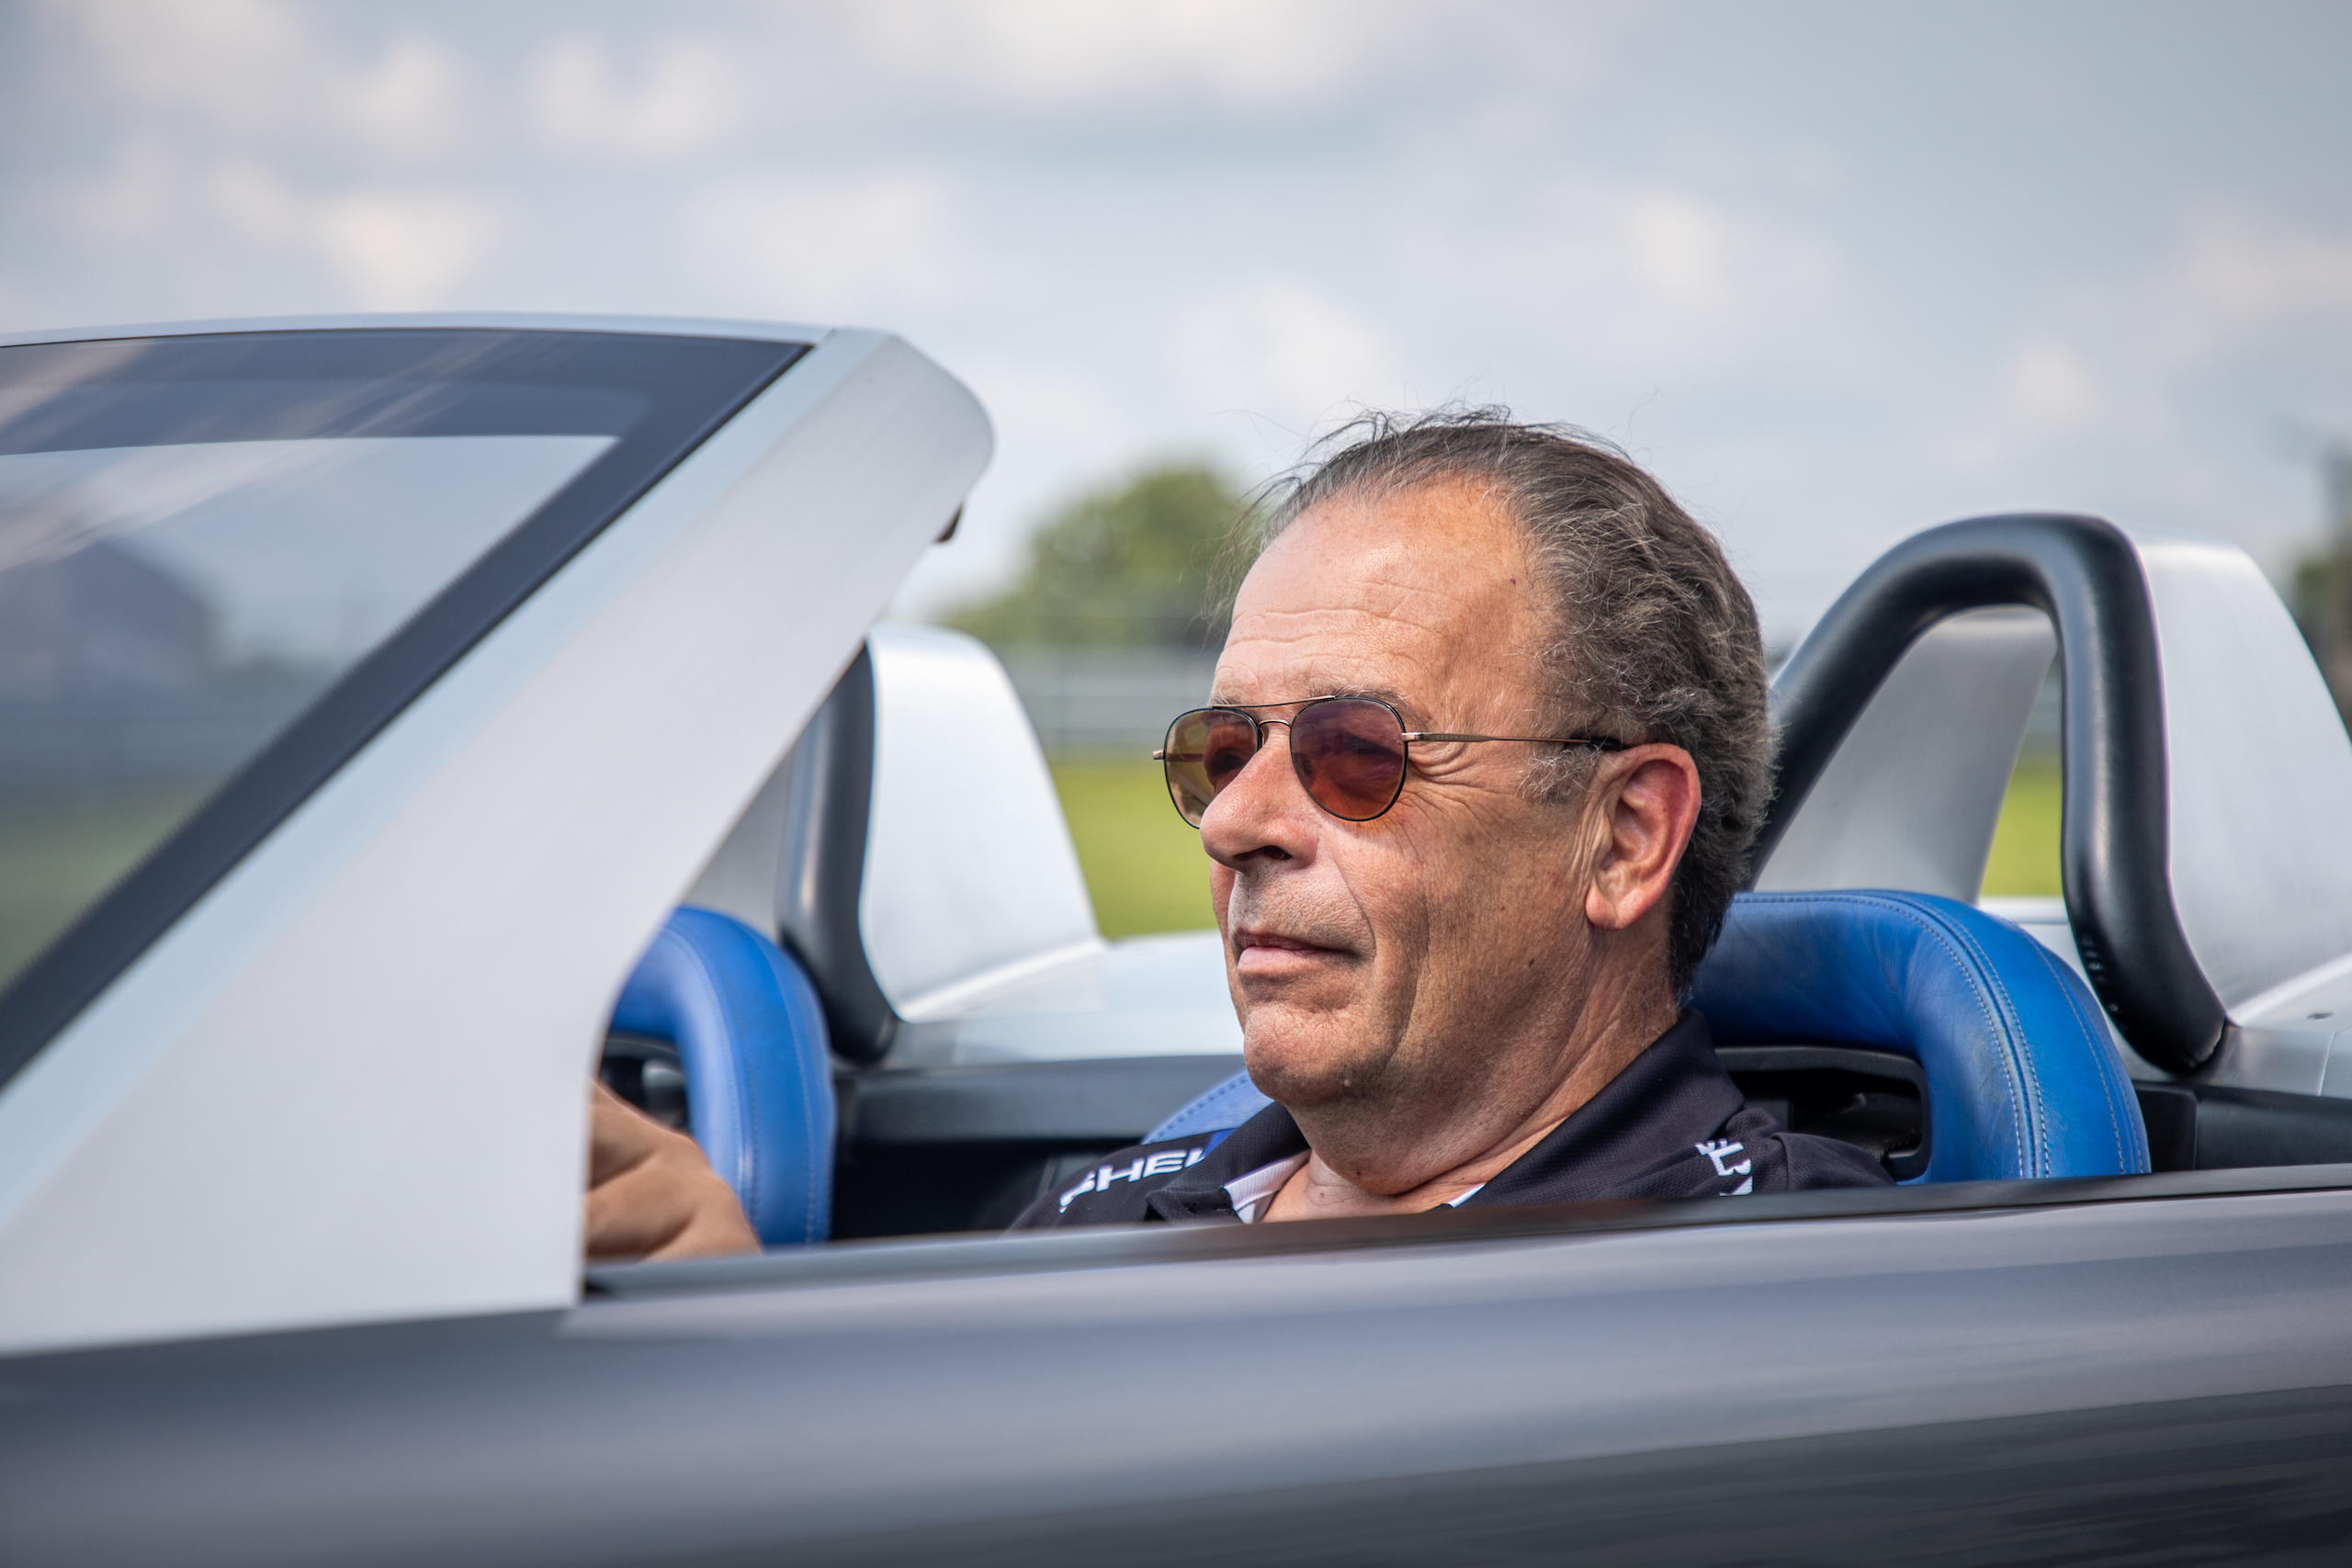 Cobra Concept driver portrait behind wheel